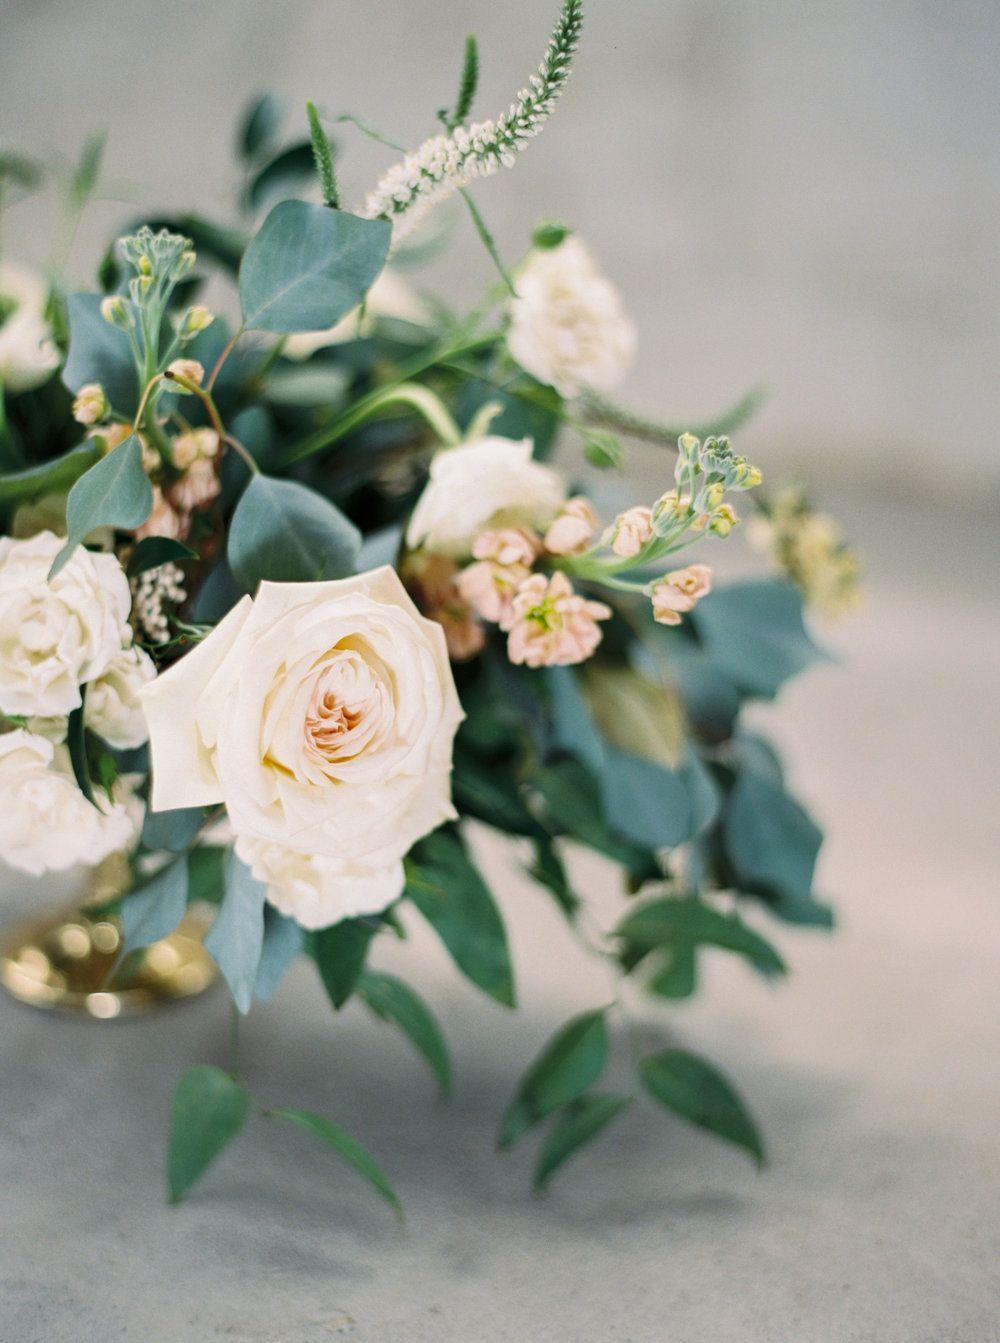 Maxit Flower Design Houston Texas High End Flower Event Florist And Wedding Designer Country Wedding Flowers Daisy Wedding Flowers Bright Wedding Flowers